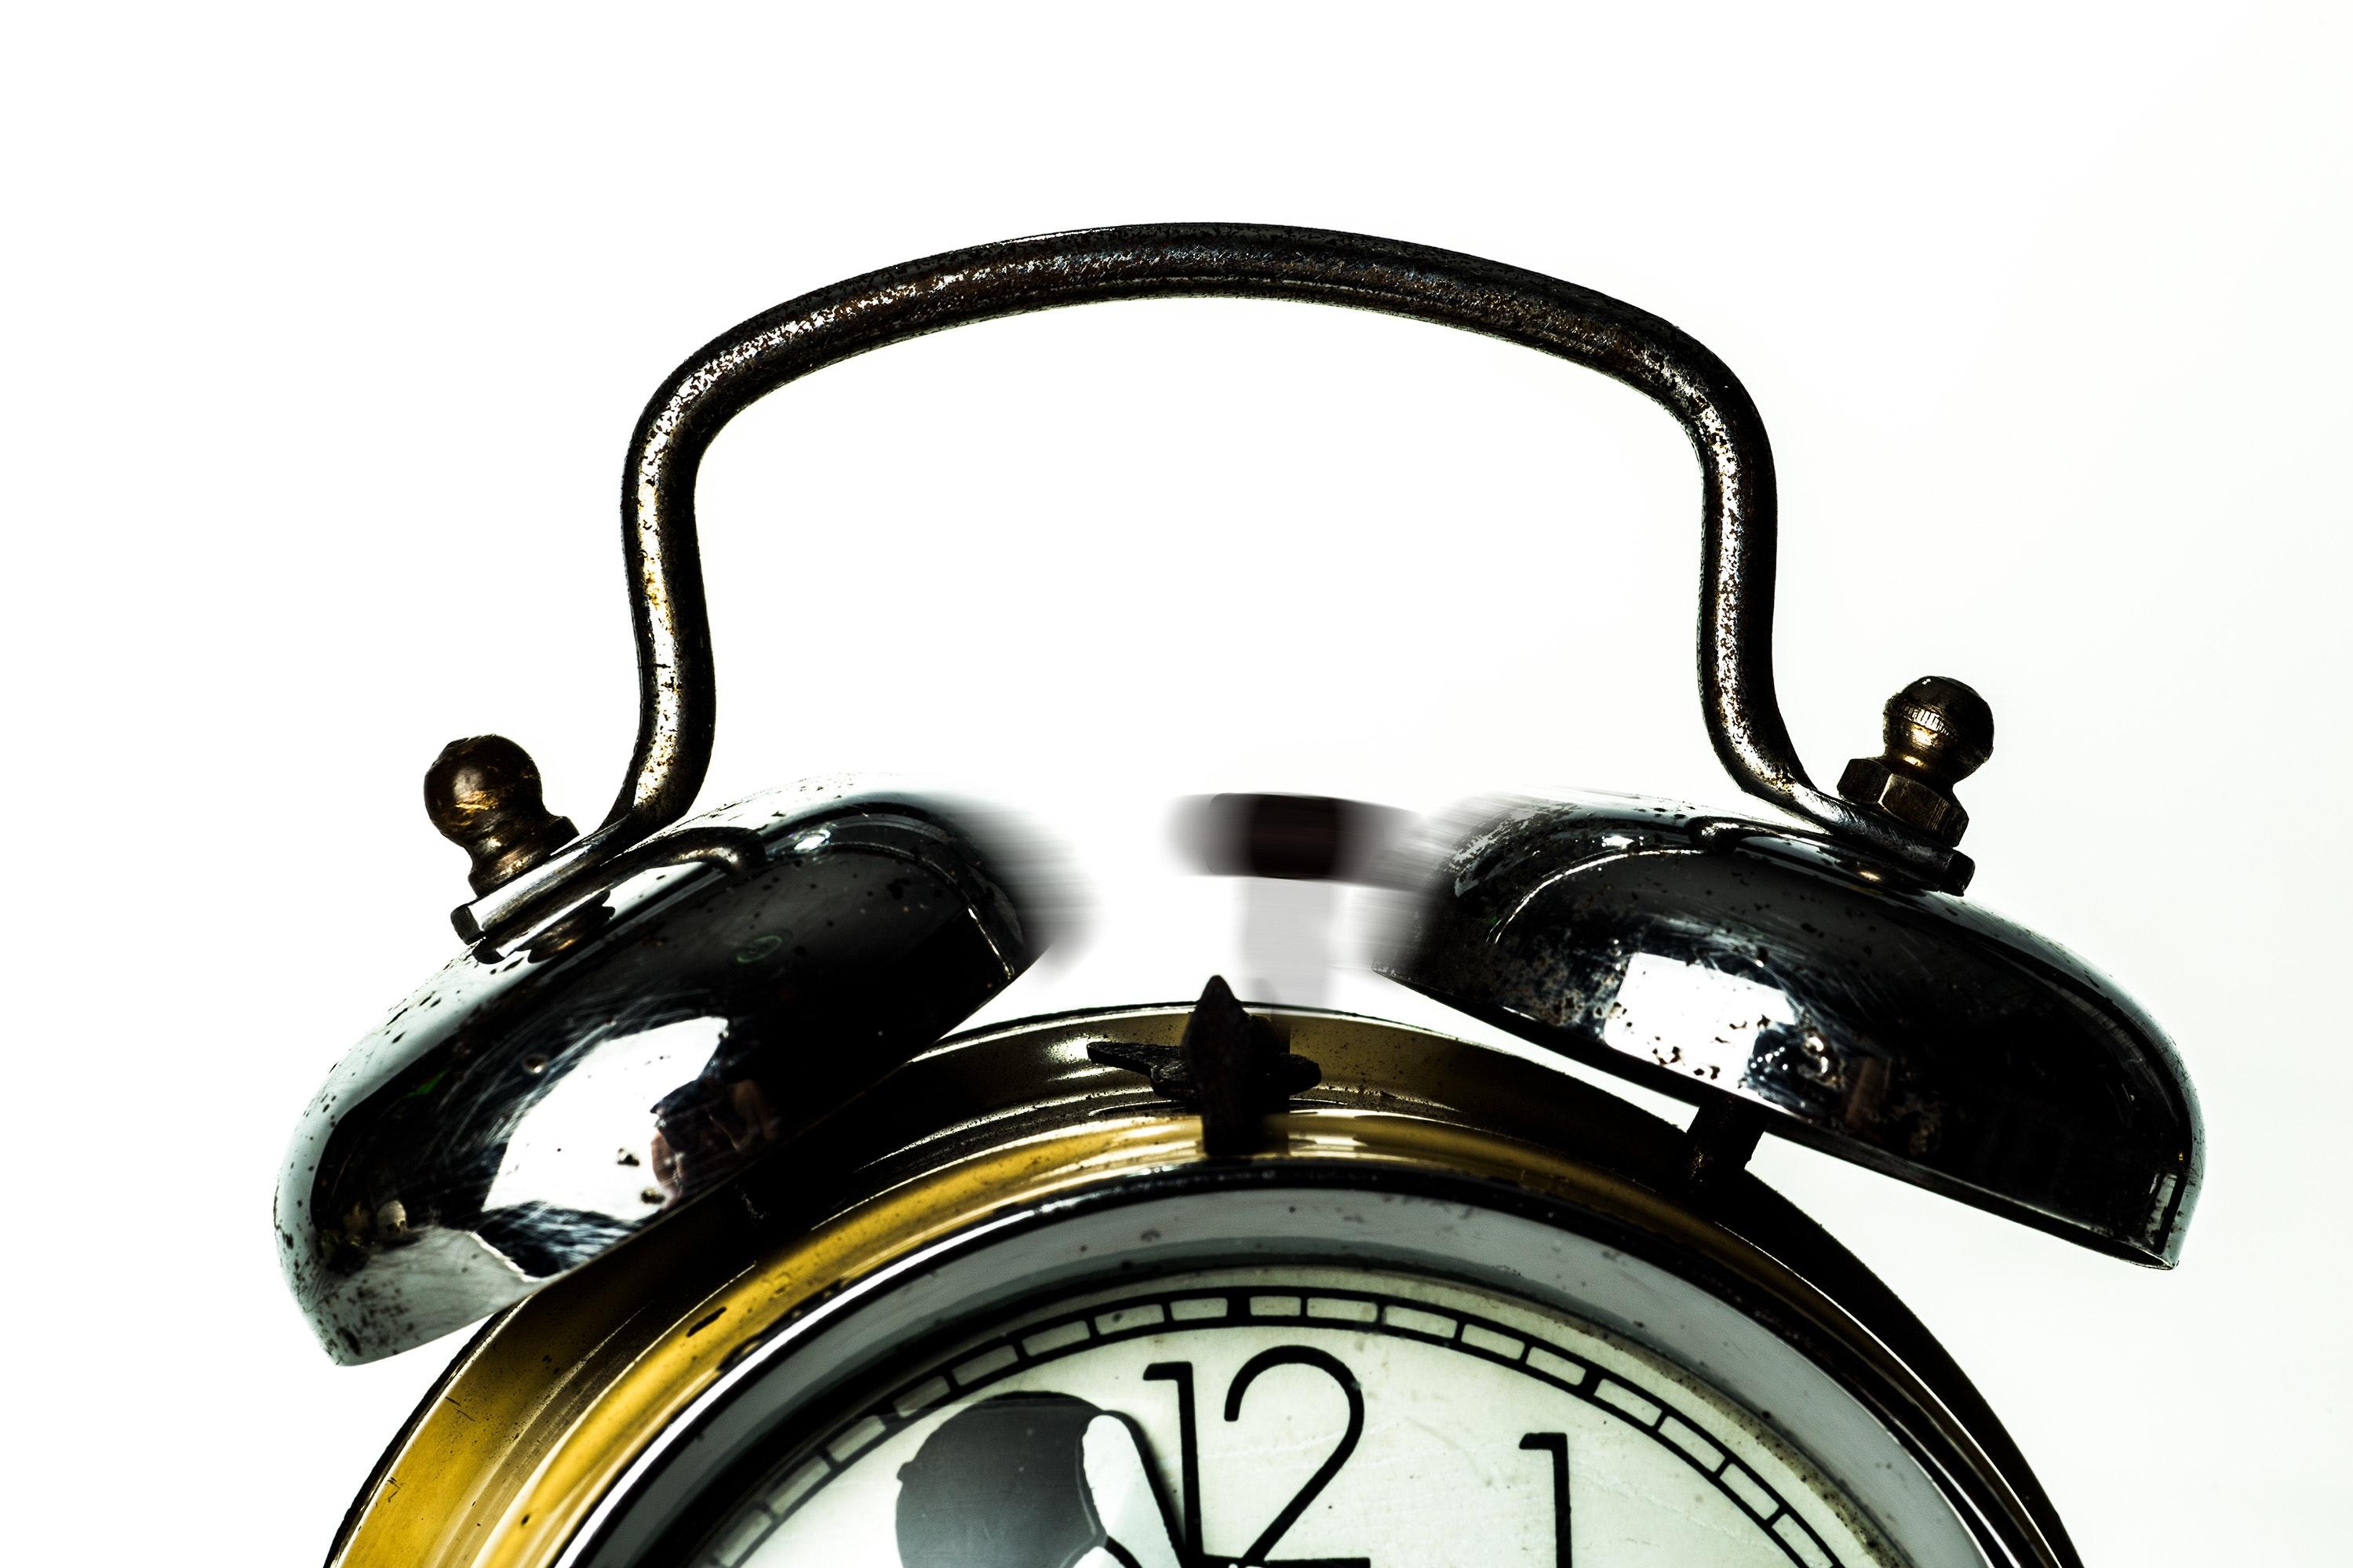 Black Ring Bell Alarm Clock, Alarm, Numbers, Wake, Vintage, HQ Photo